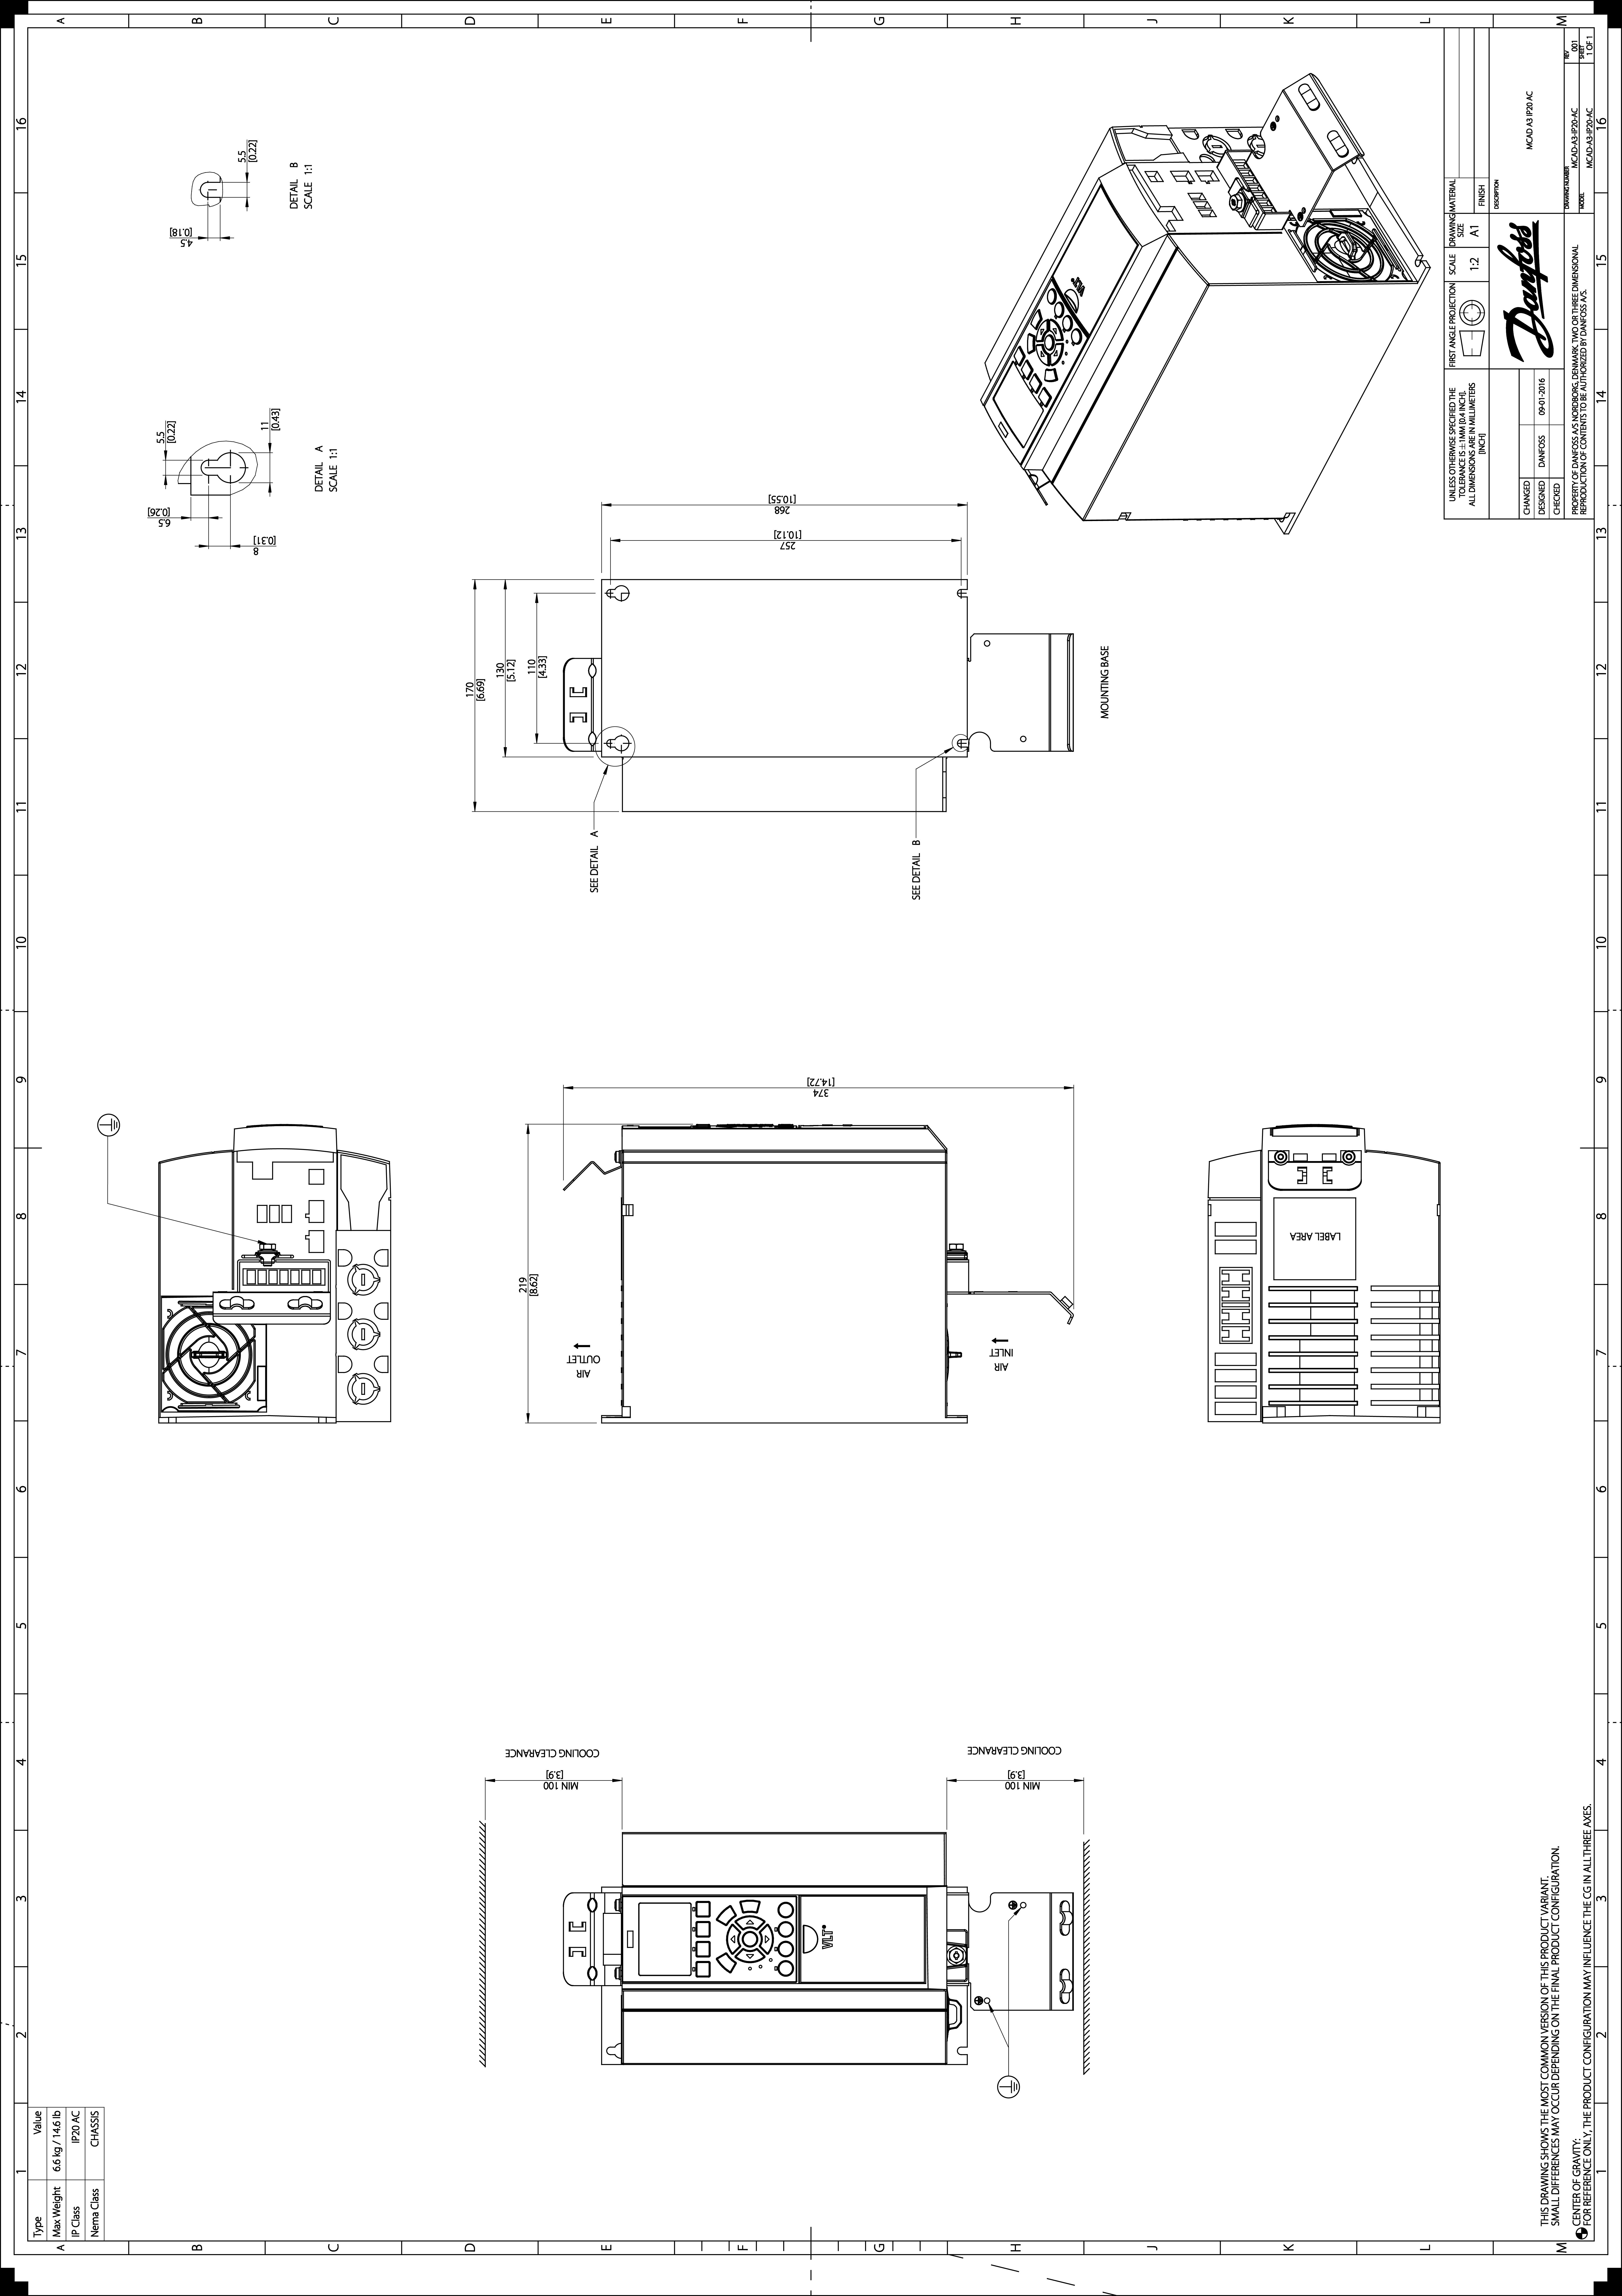 Vlt Aqua Drive Fc 202 Danfoss Ac Supply Through An Lr Series Circuit 34 Mb